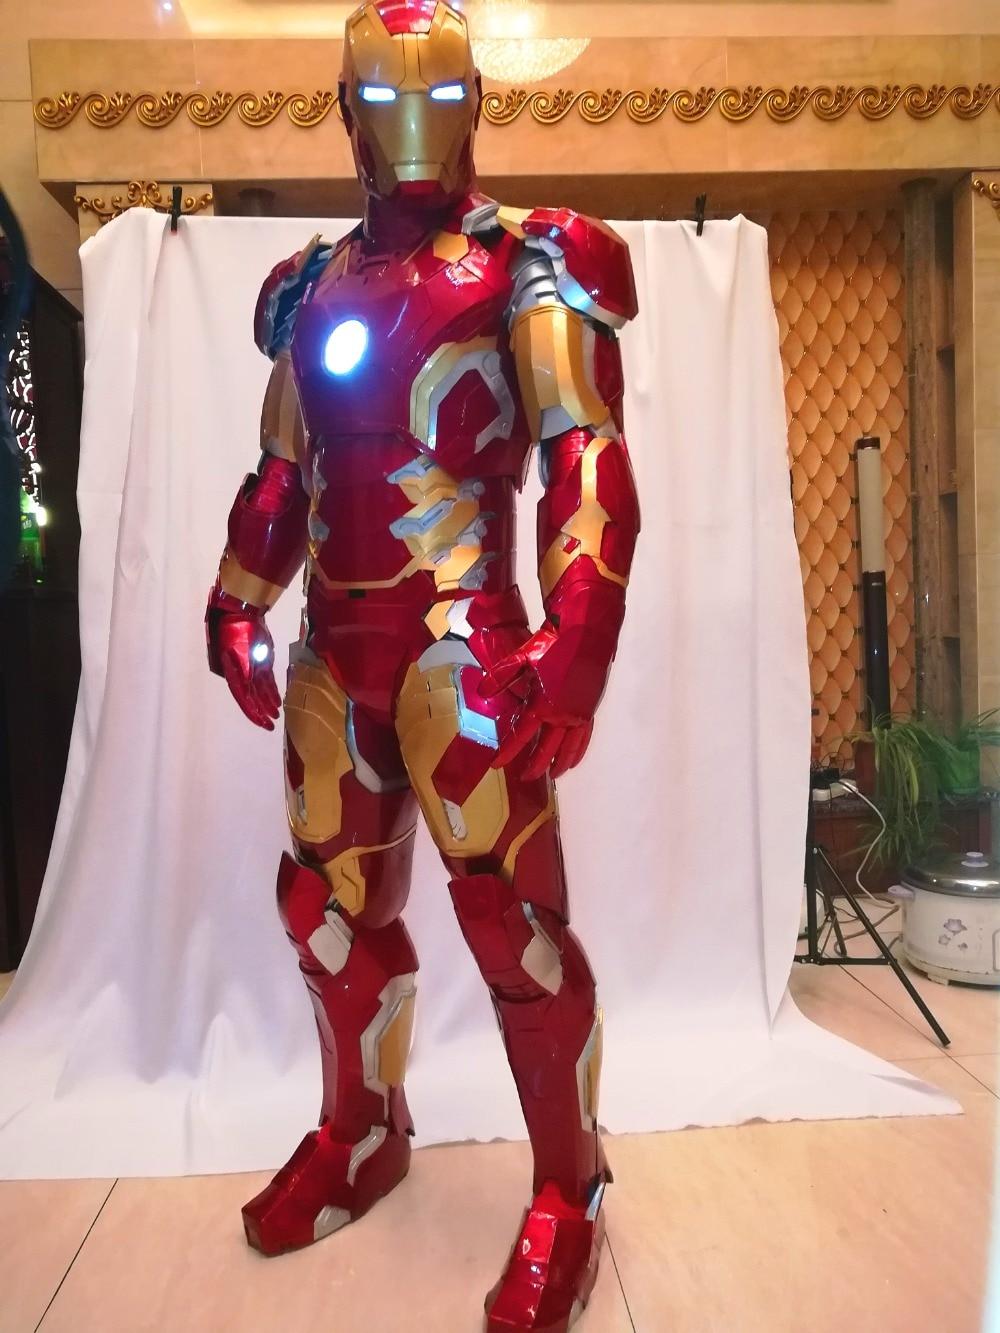 Iron Man MK43 Costume Iron Man Cosplay Costume portable sur mesure et film précis Iron Man armure